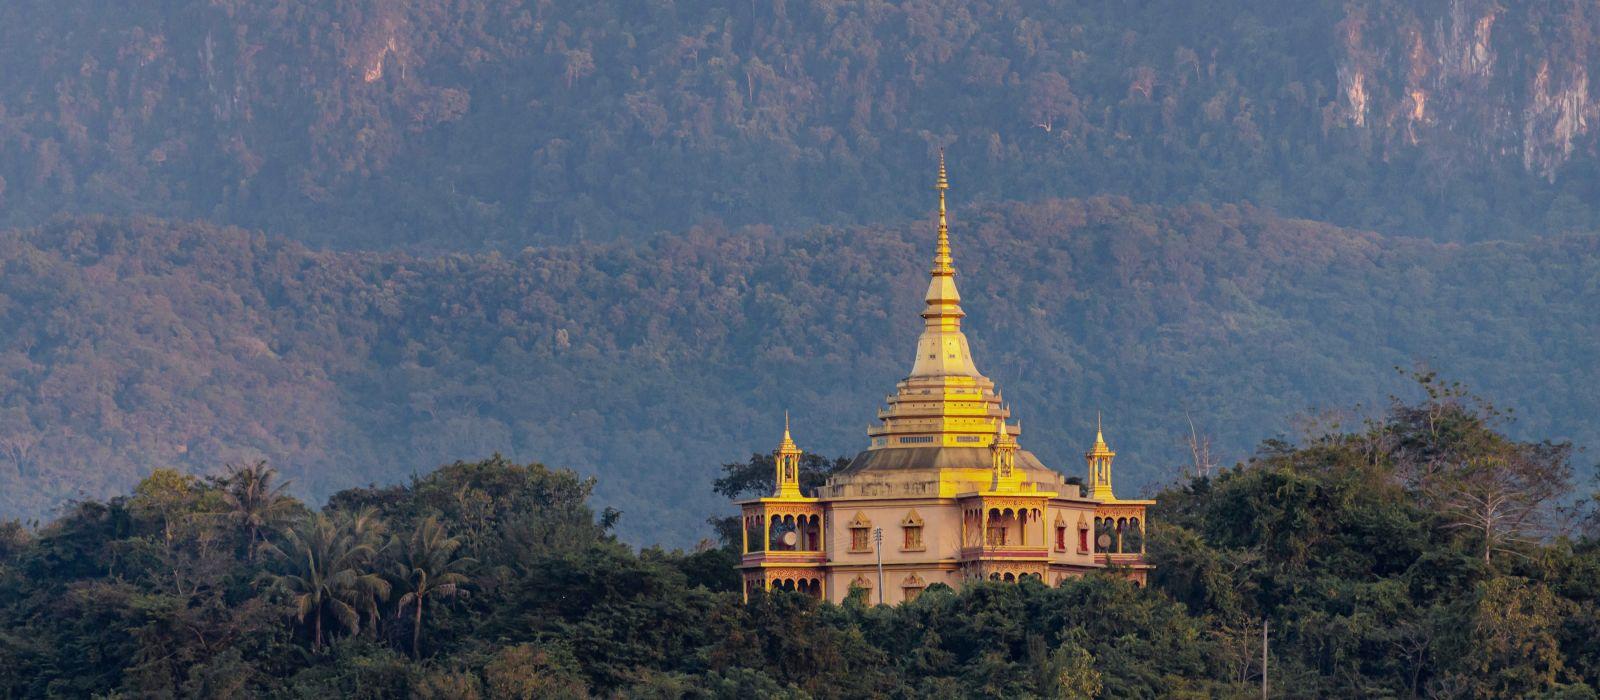 Asia Tour: Luxury & Private Tours to Asia | Enchanting Travels